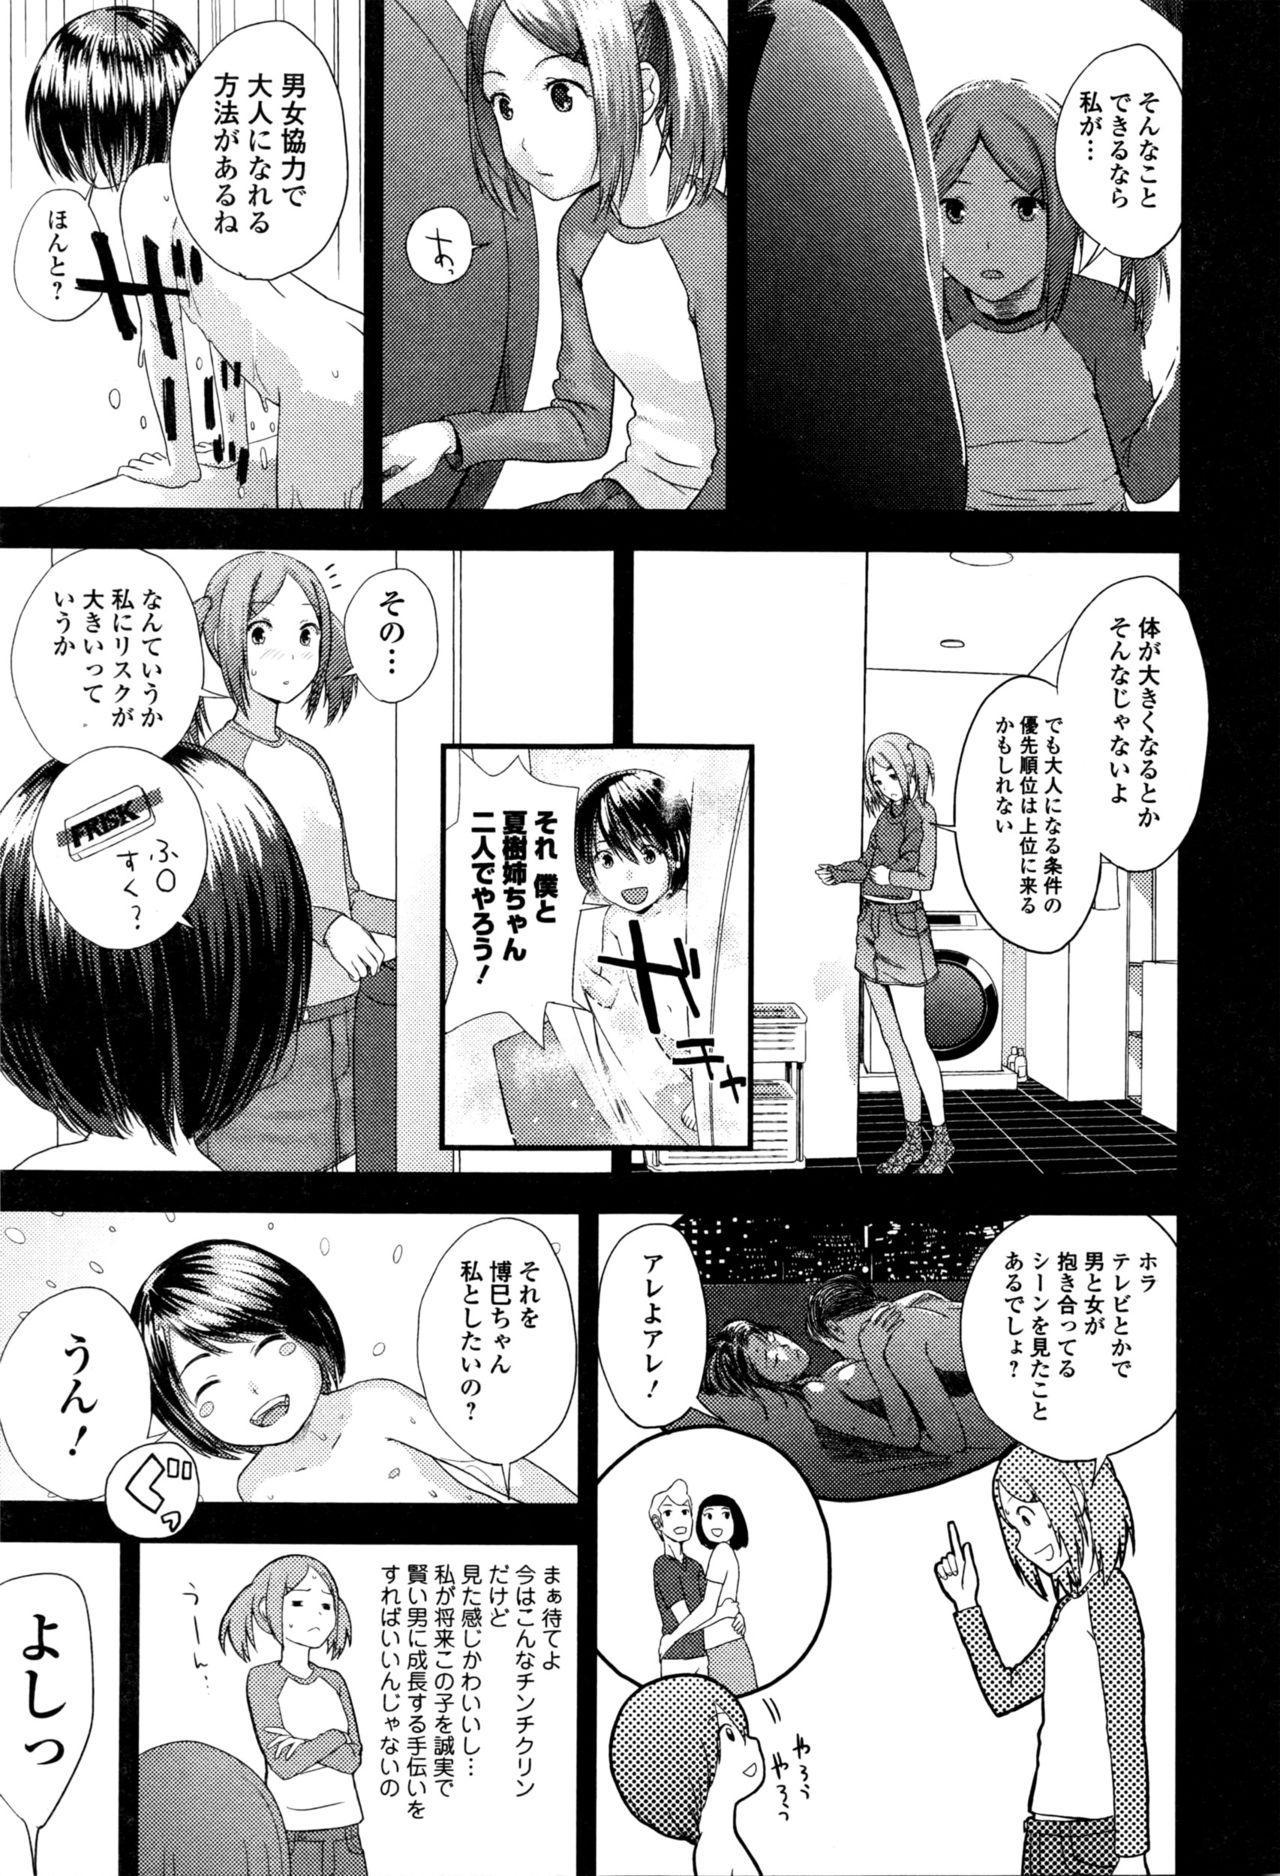 Comic JSCK Vol.4 2016-05 11